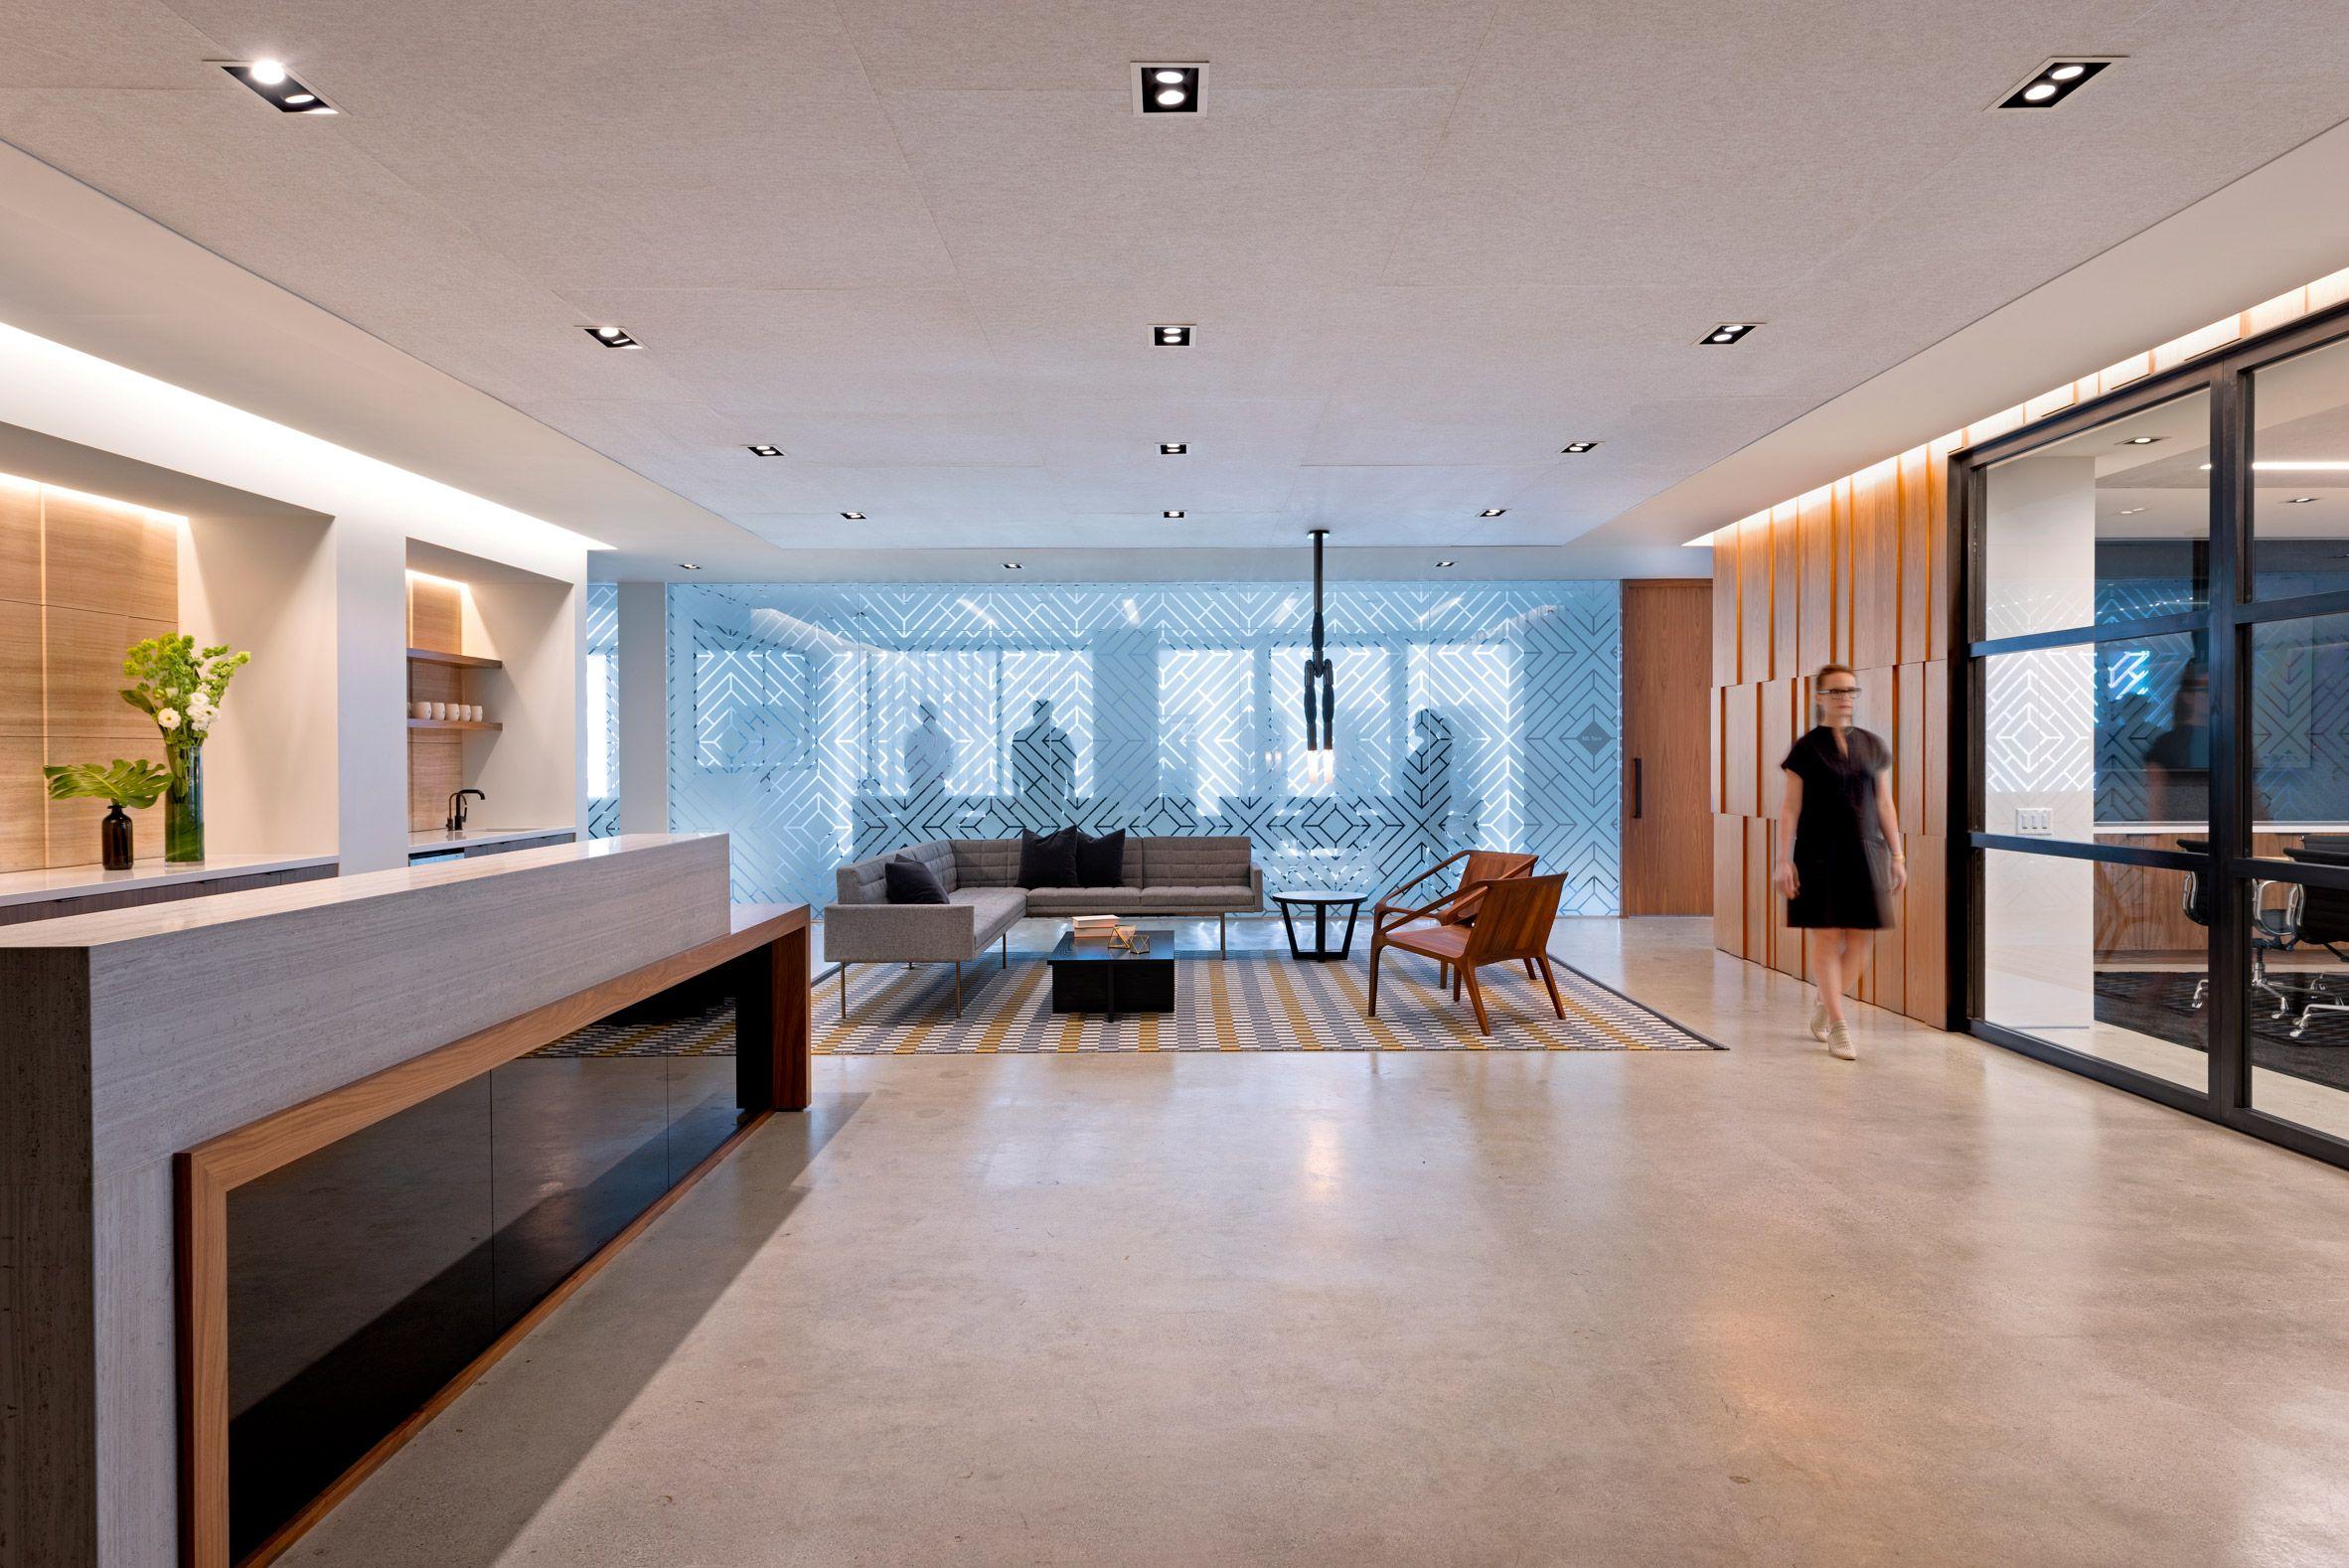 evernote office studio oa 05. Studio Oa Designs. Cambridge Associates By OA Designs Evernote Office 05 E